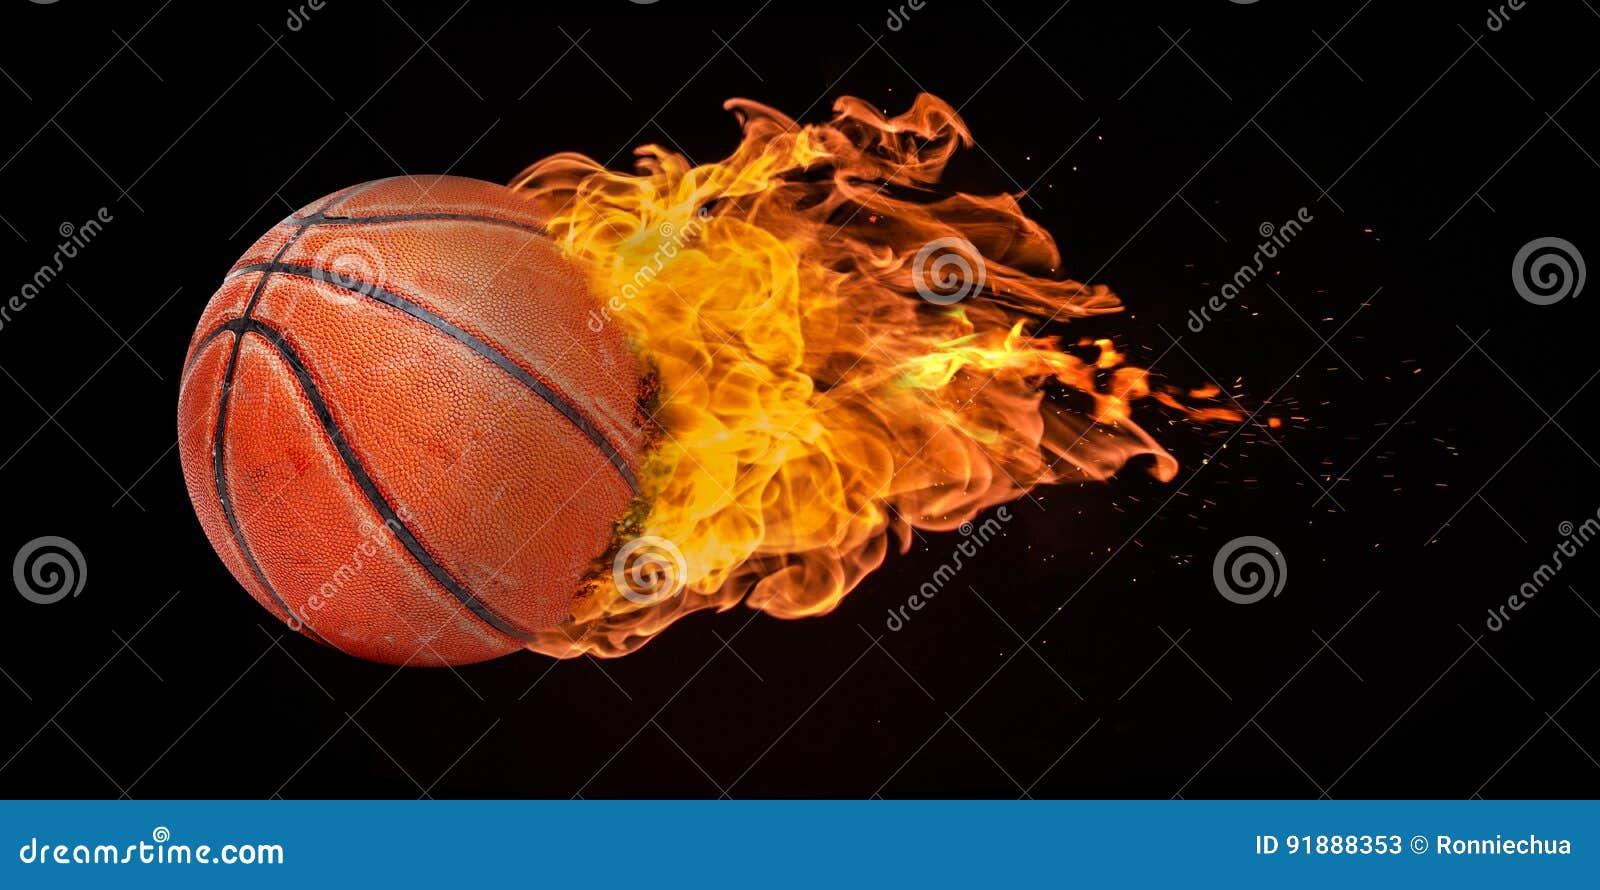 Basket-ball de vol englouti en flammes